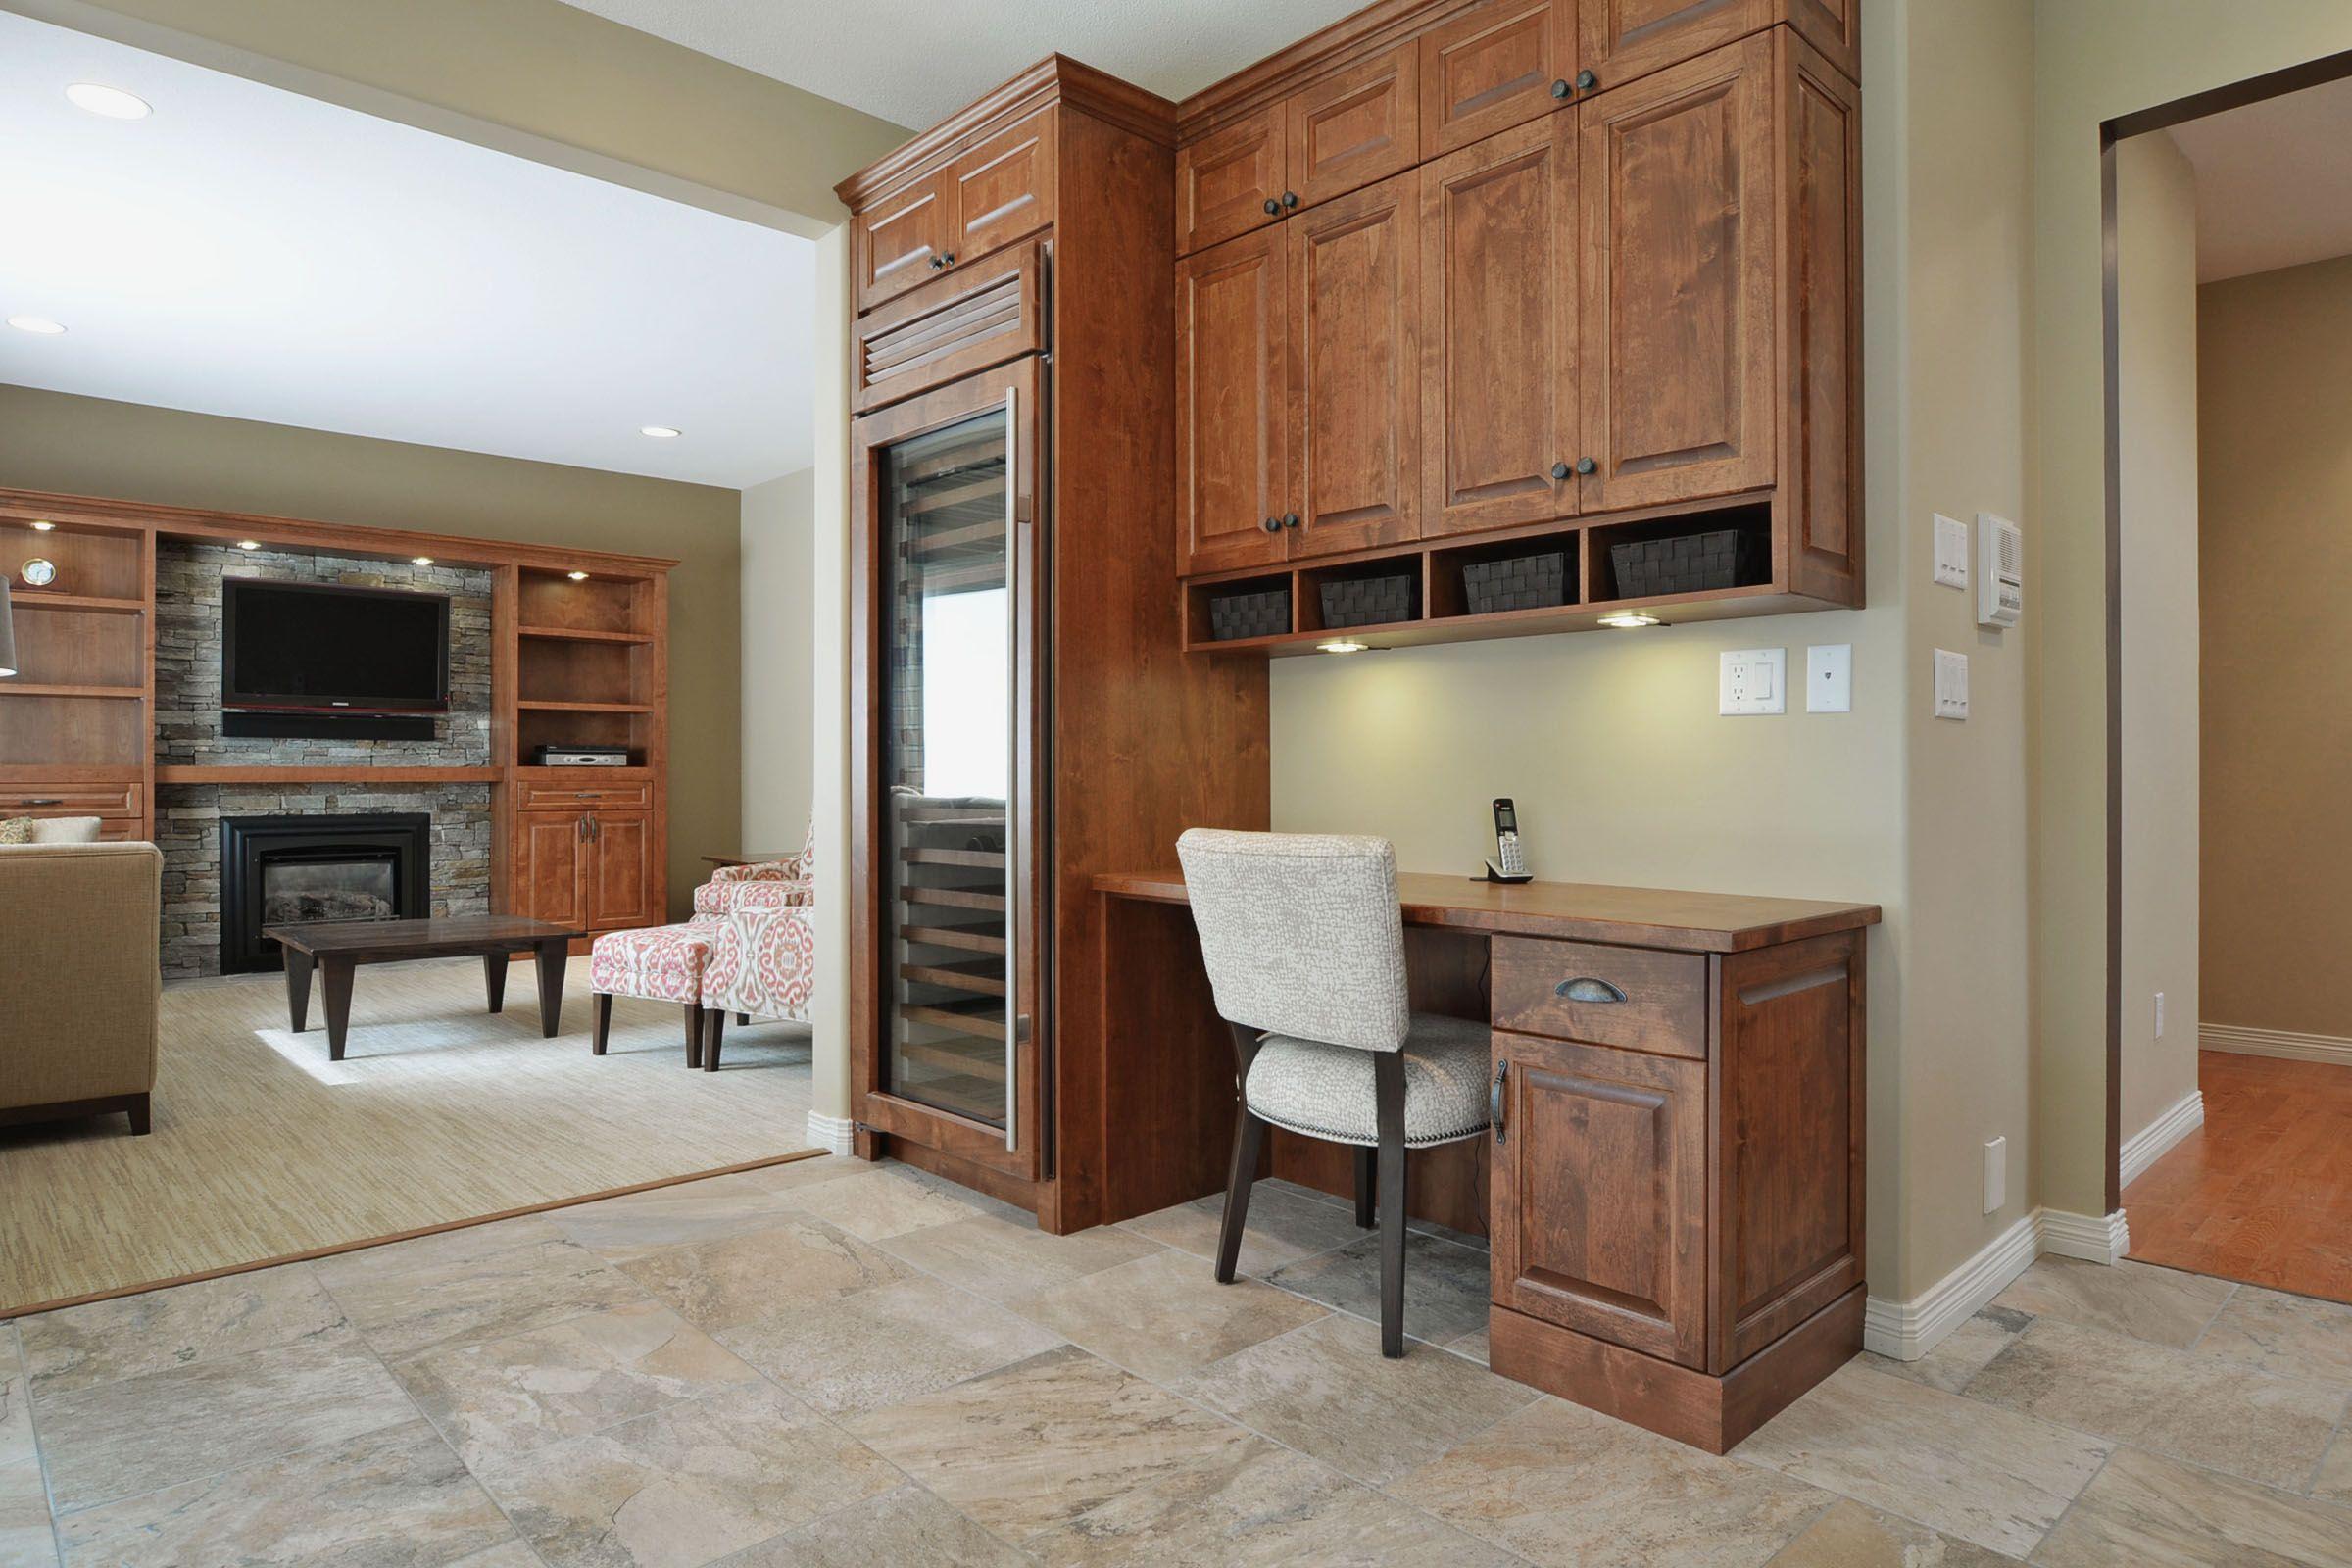 14476 30A Avenue, South Surrey, BC | Birch cabinets ...